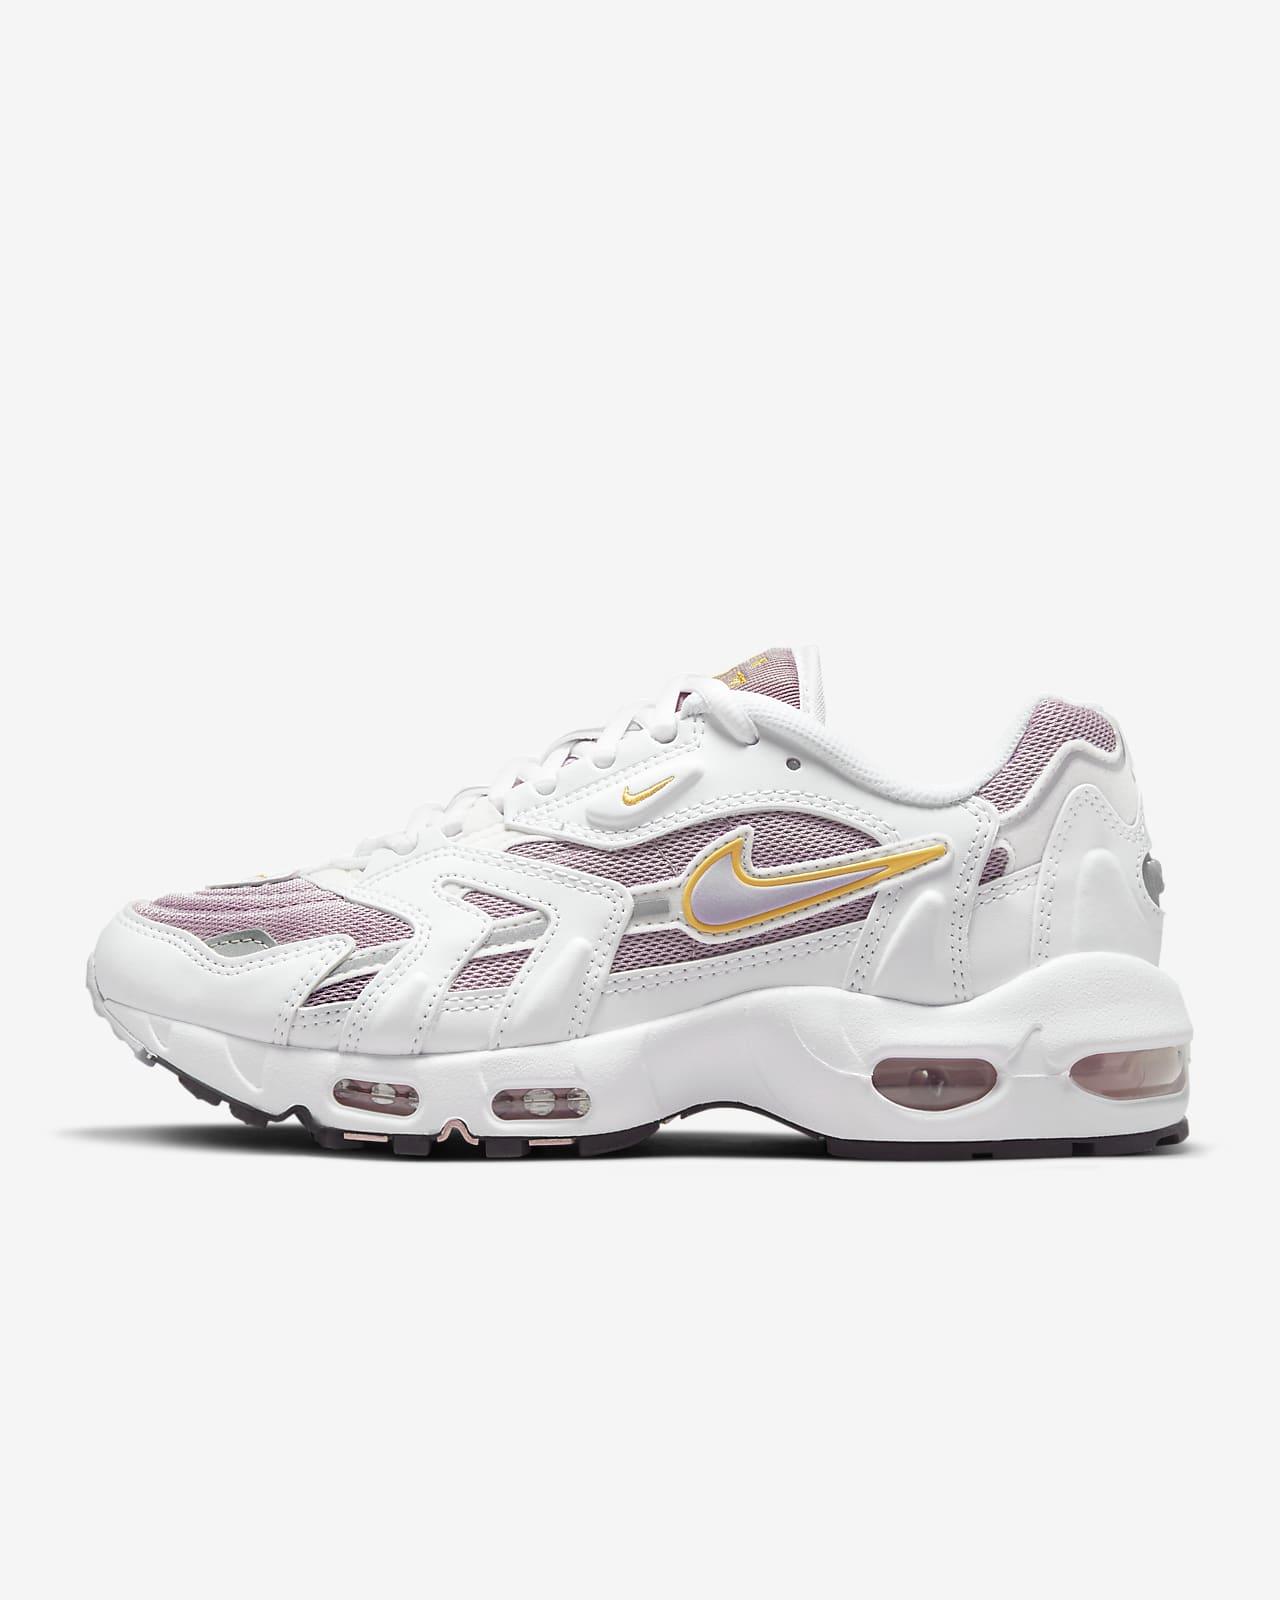 Nike Air Max 96 2 Women's Shoes